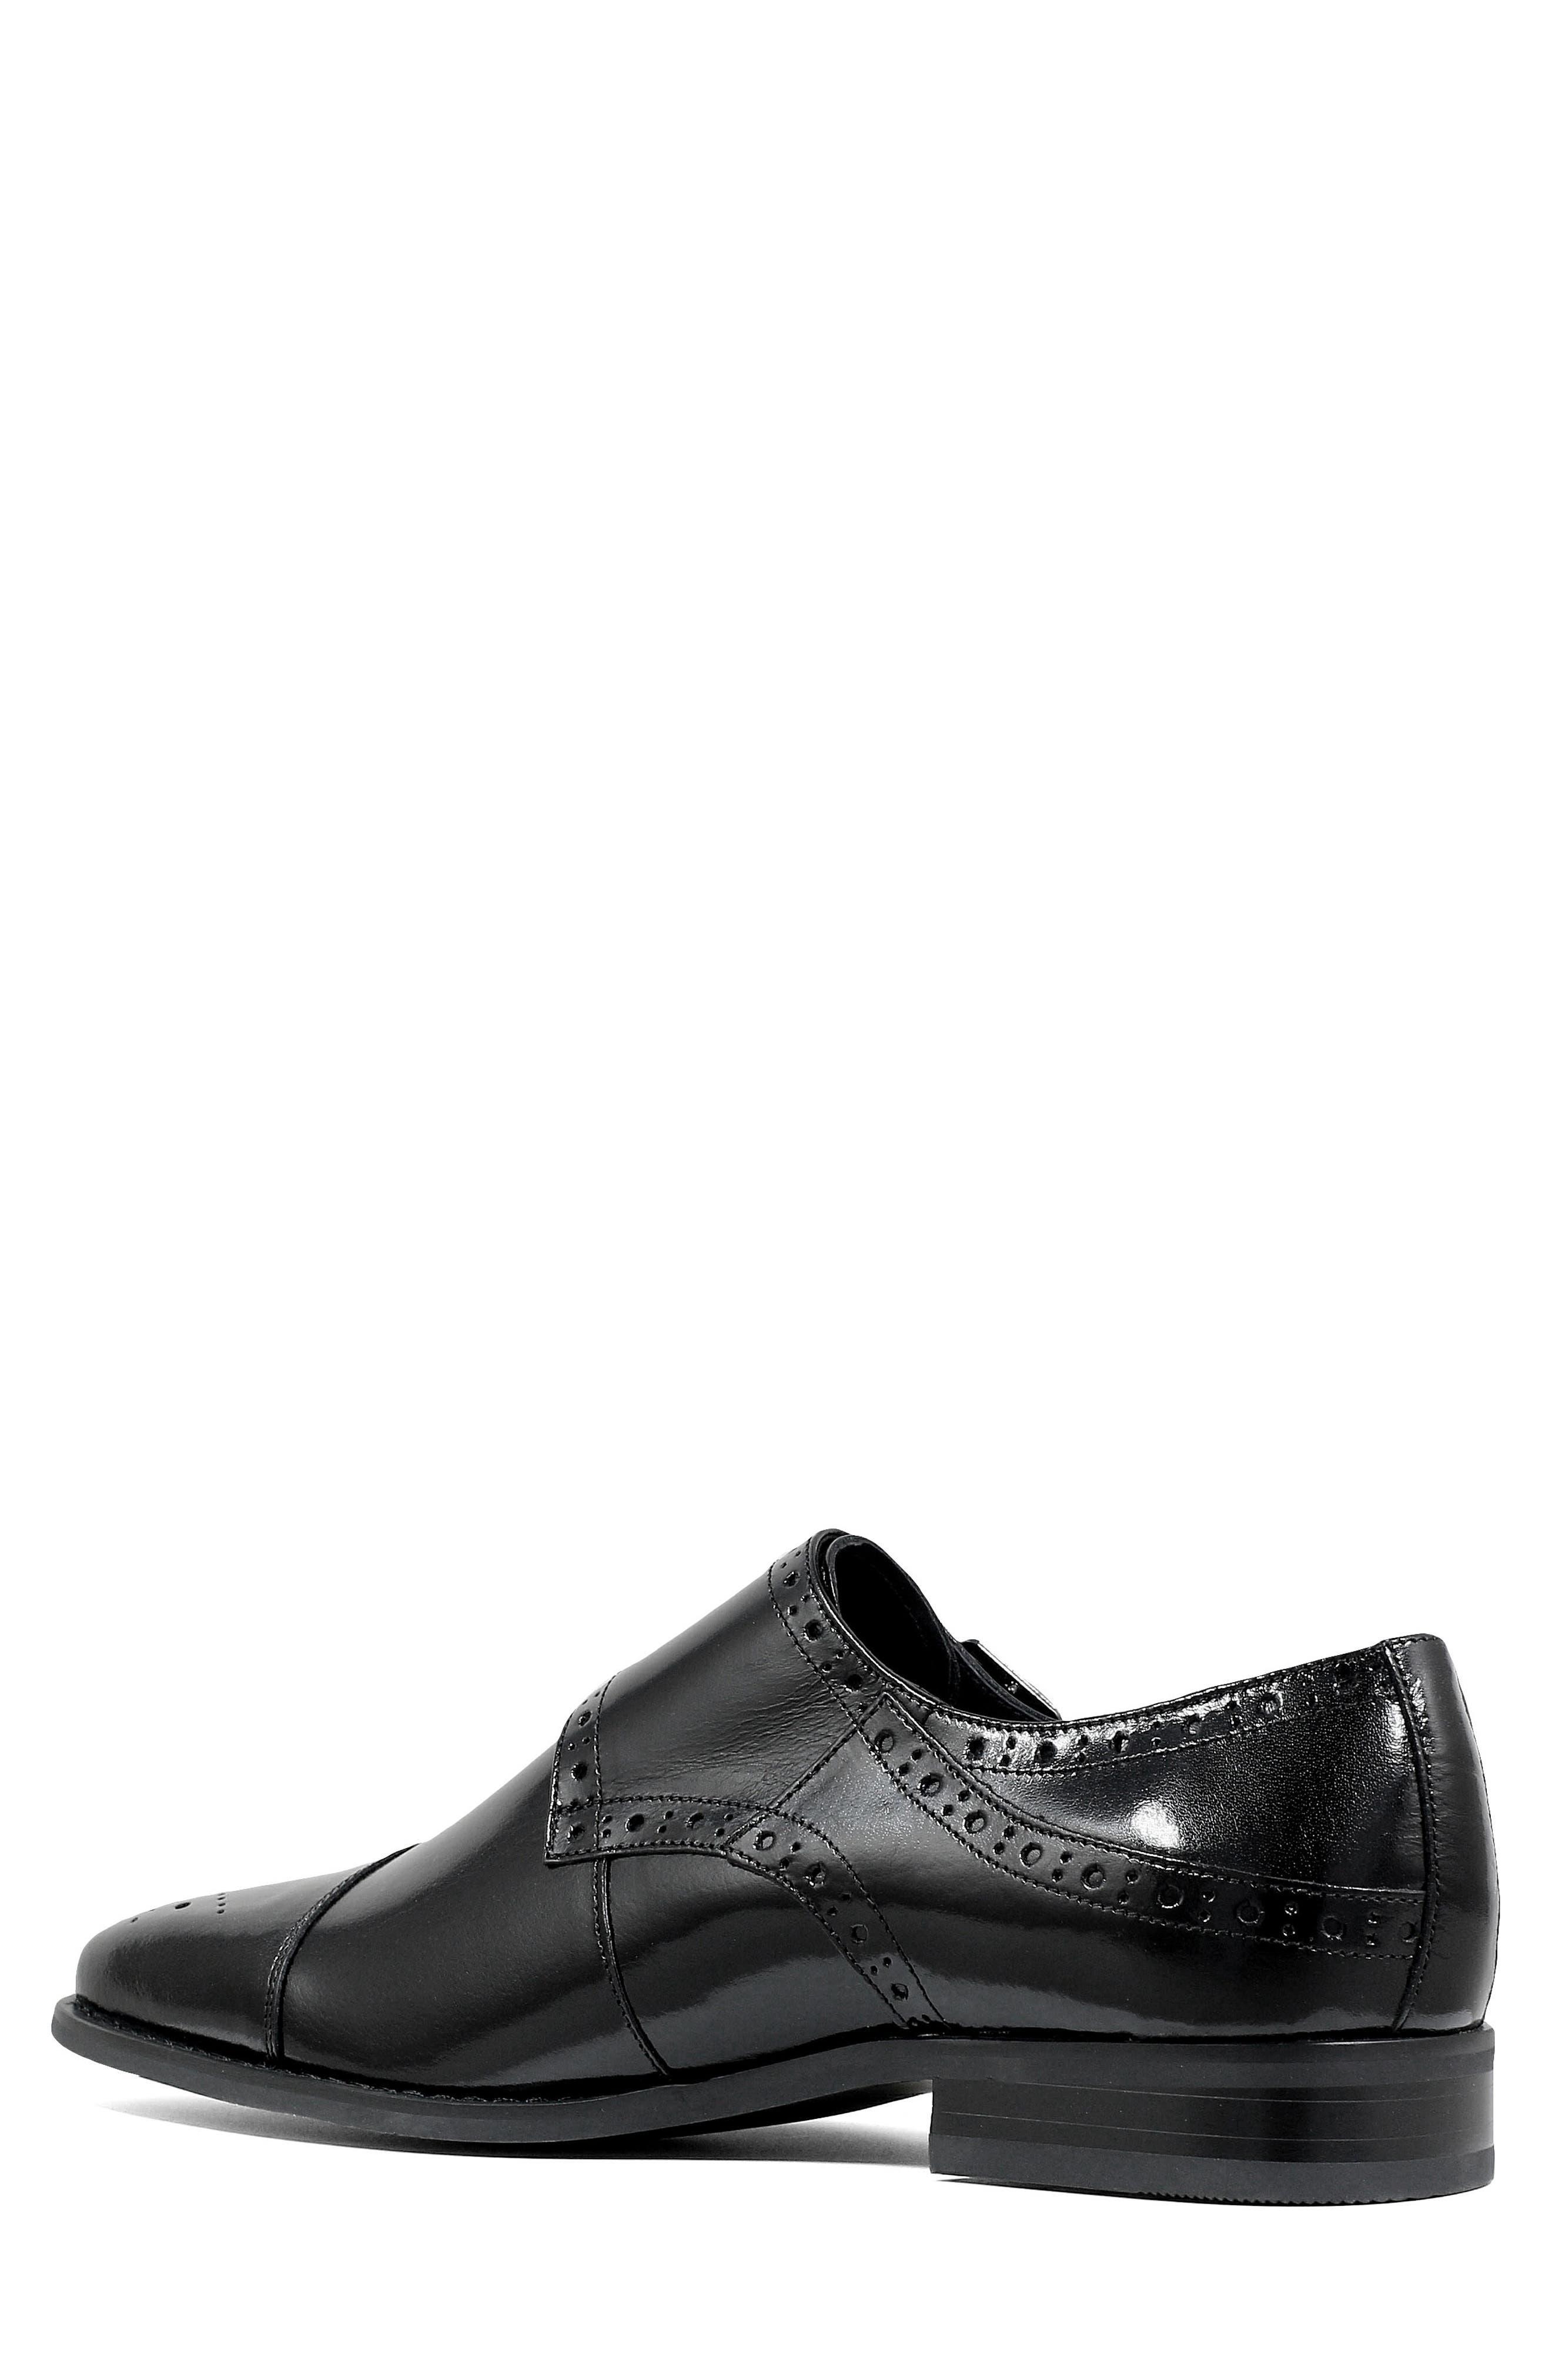 Tayton Cap Toe Double Strap Monk Shoe,                             Alternate thumbnail 2, color,                             001